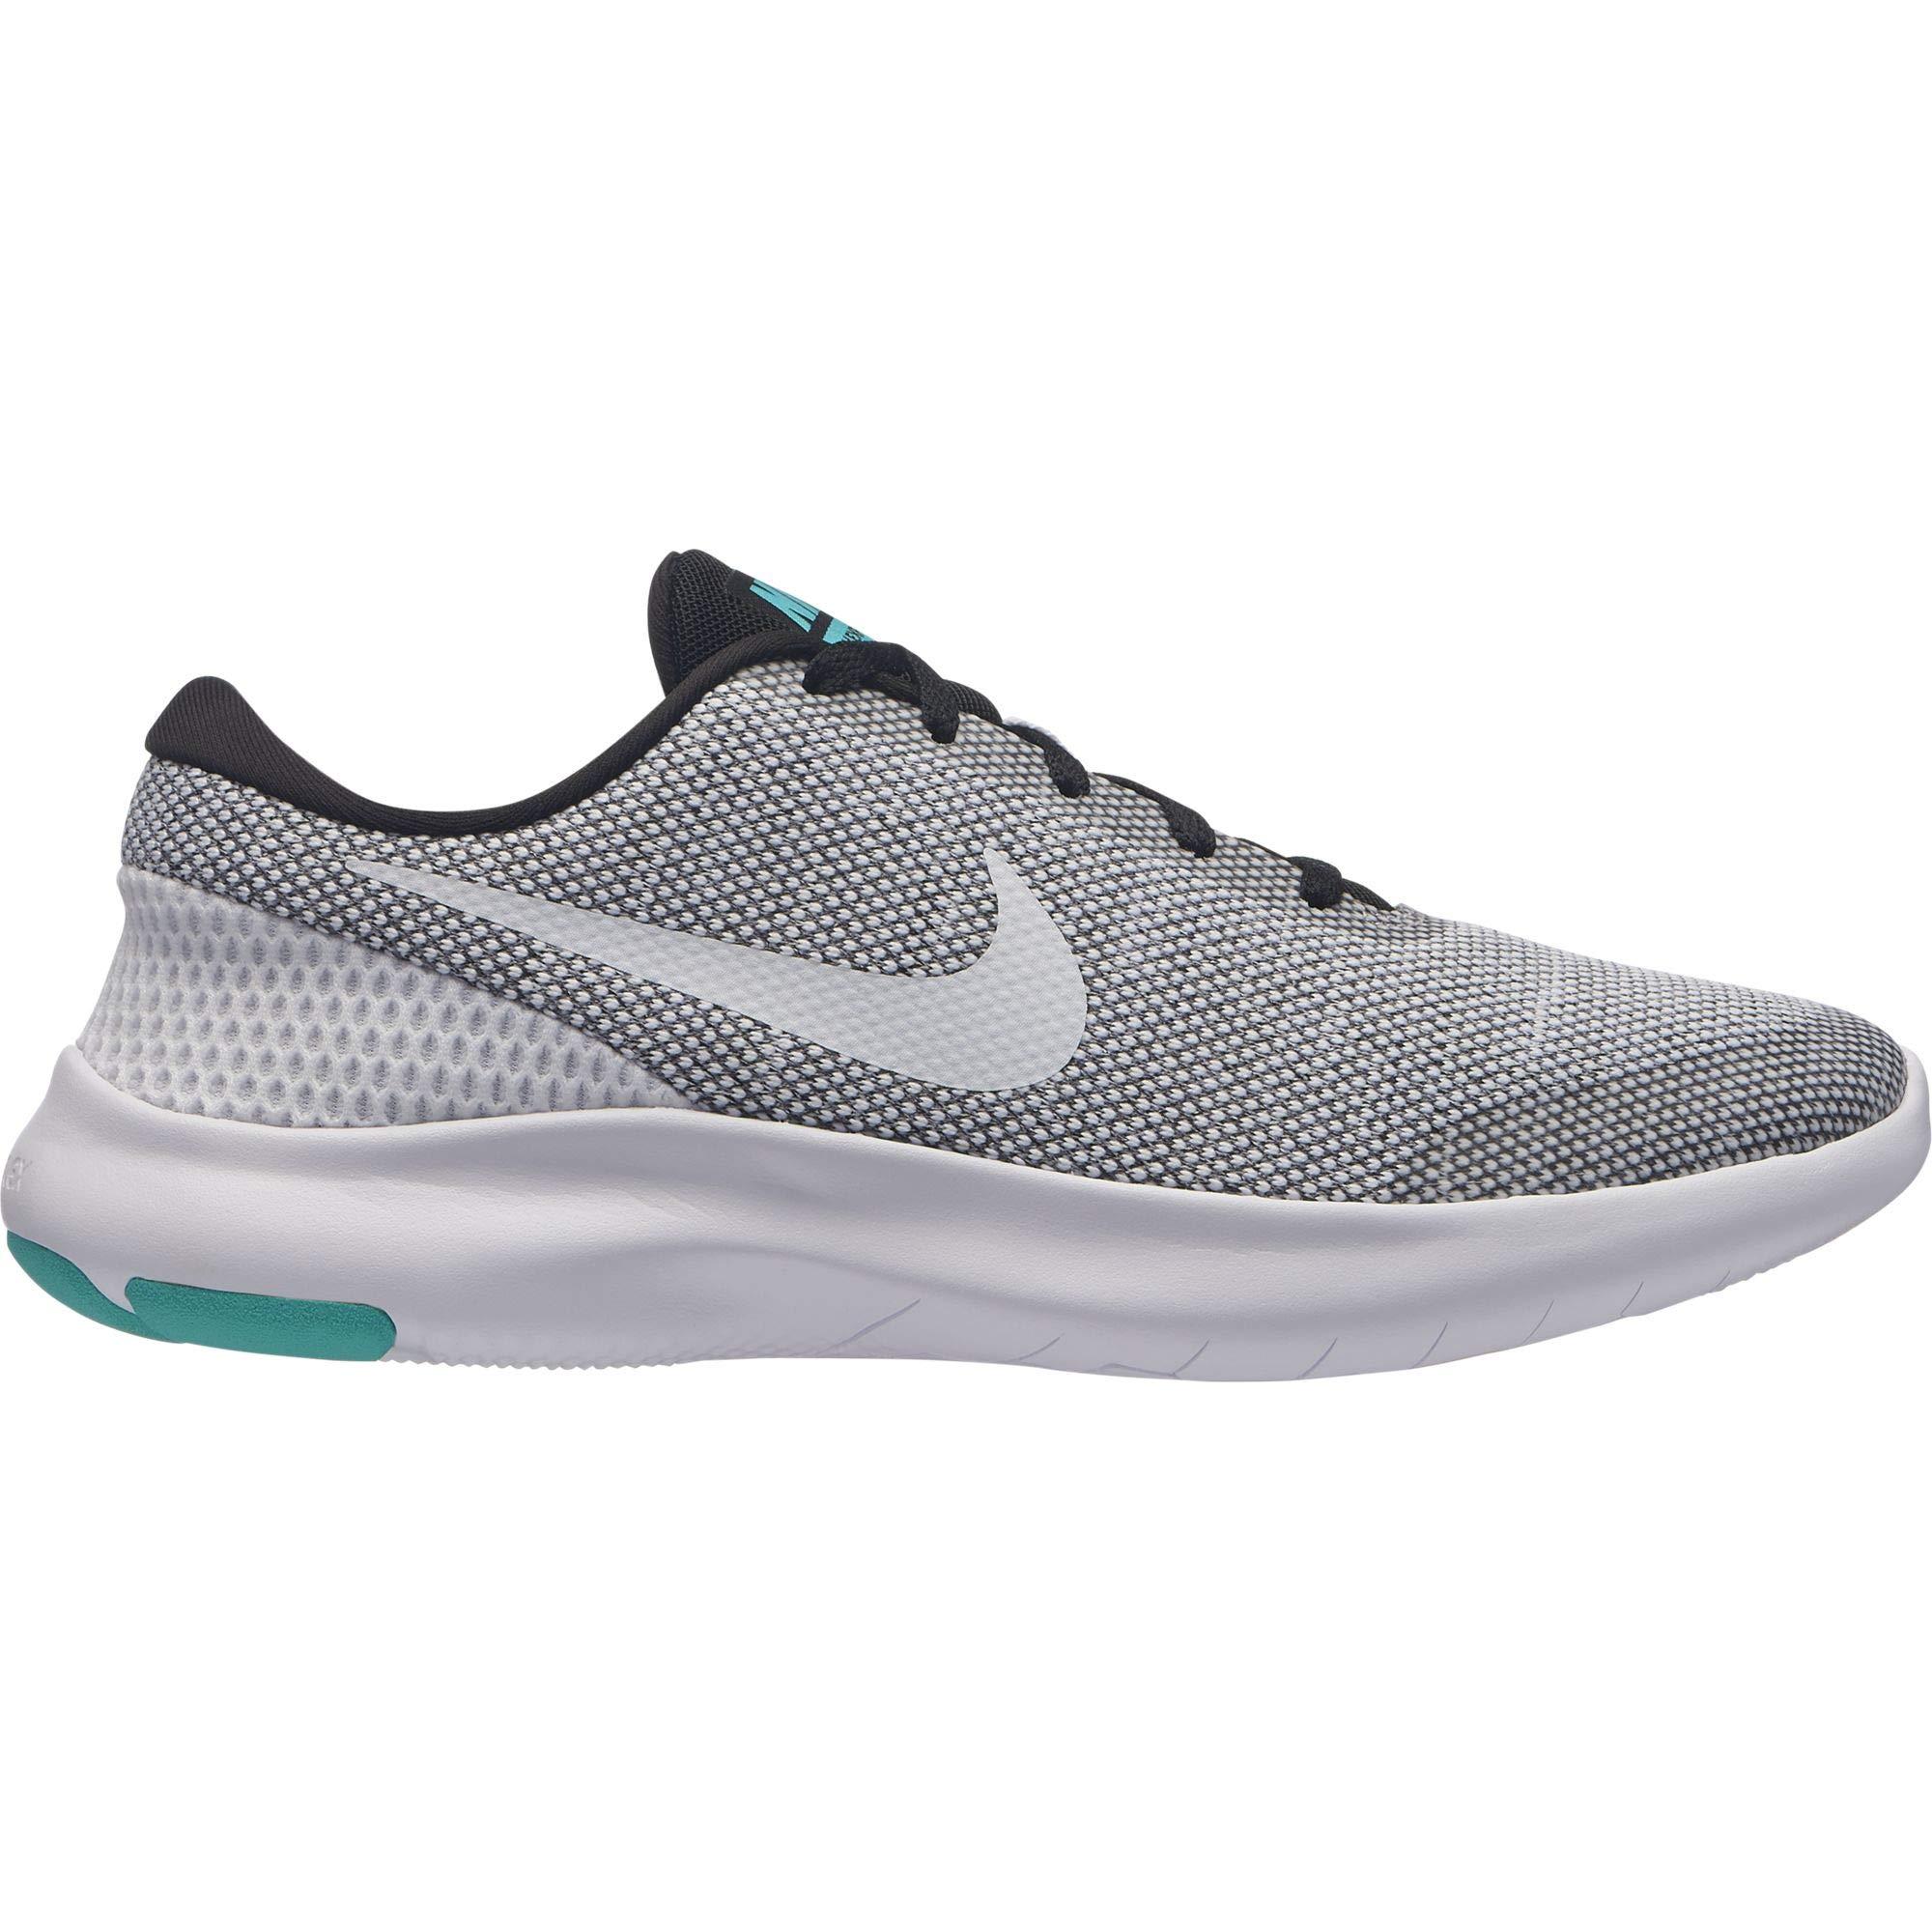 8db8d97f1e2b Galleon - Nike Women s Flex Experience RN 7 Running Shoes